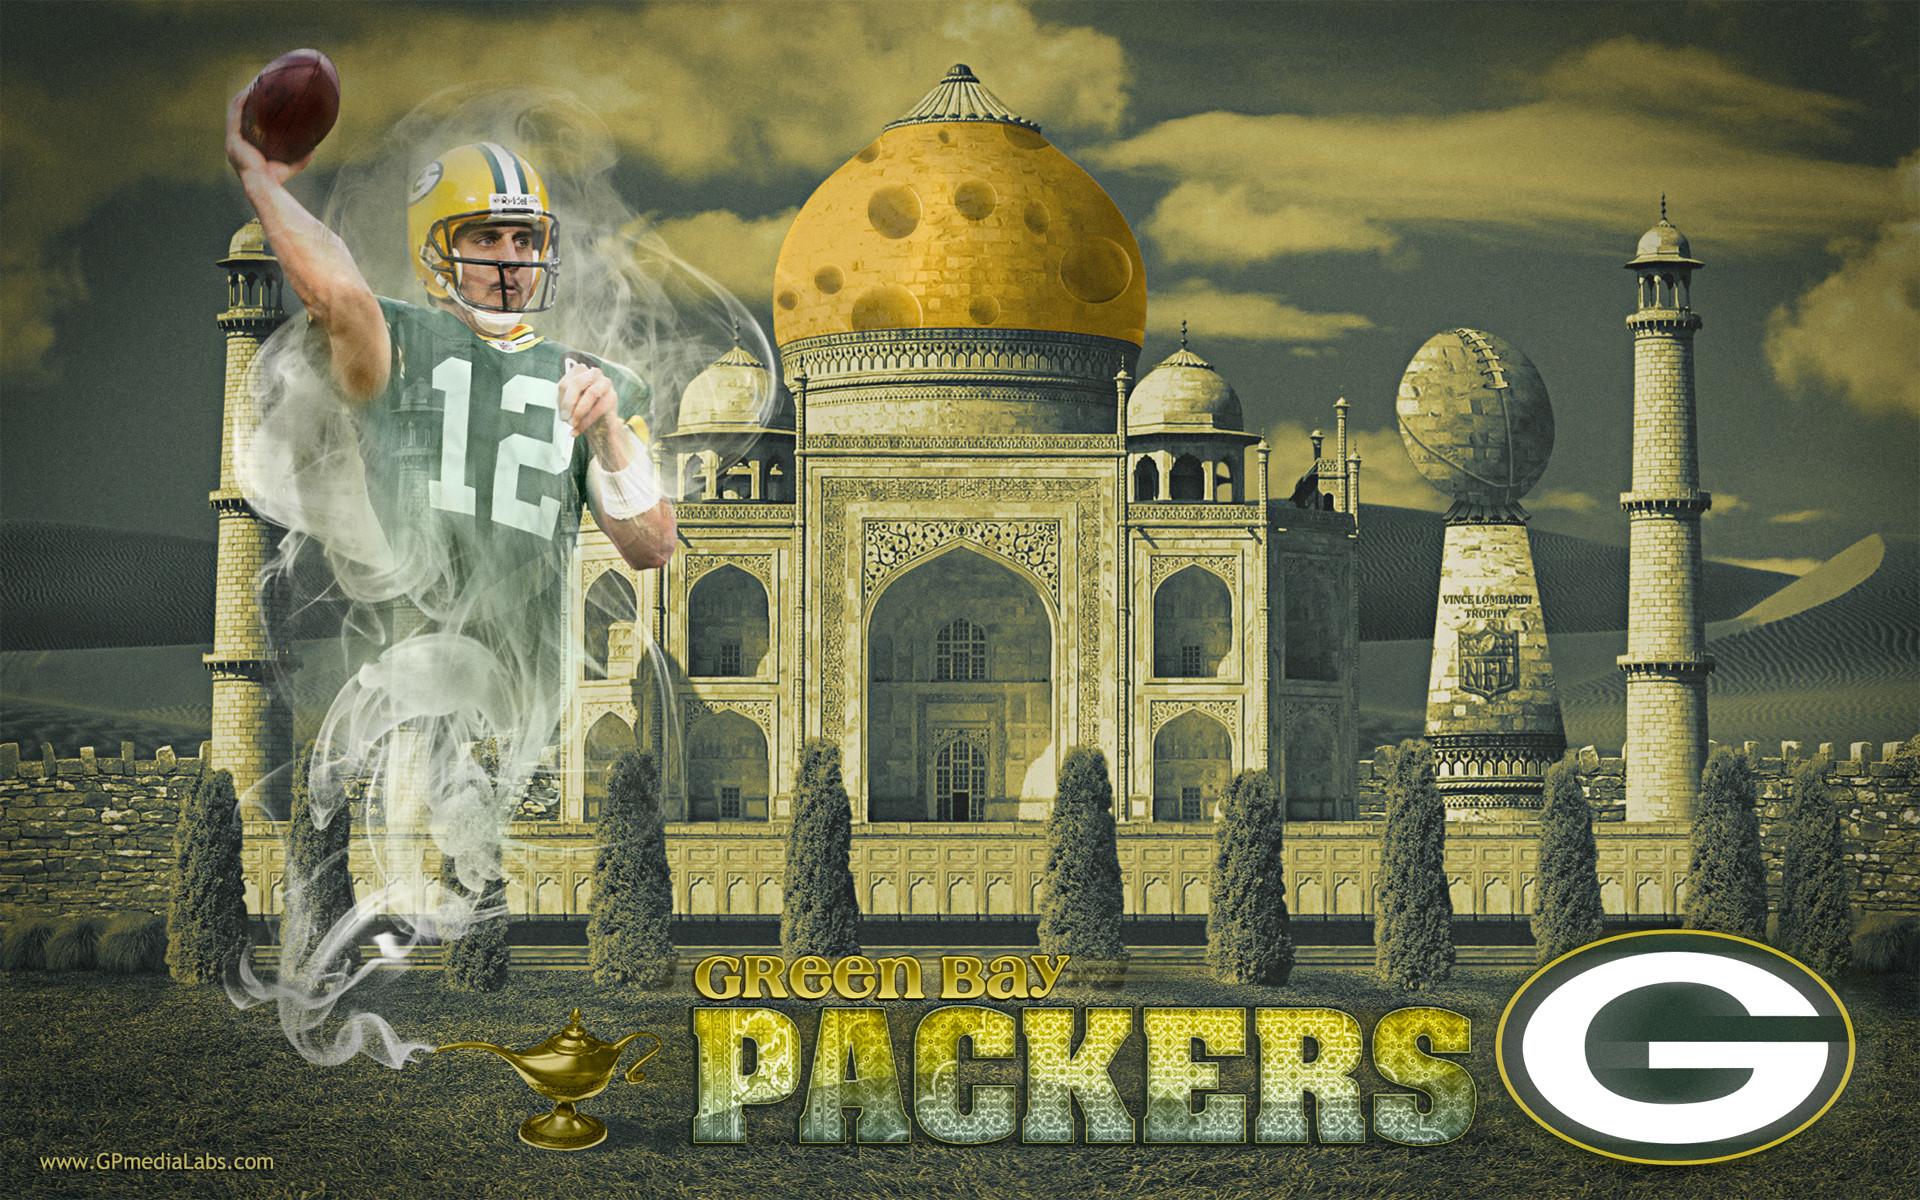 Download wallpaper: 1440 x 900 • • 2560 x 1600. Green Bay Packers  Wallpaper Aaron Rodgers